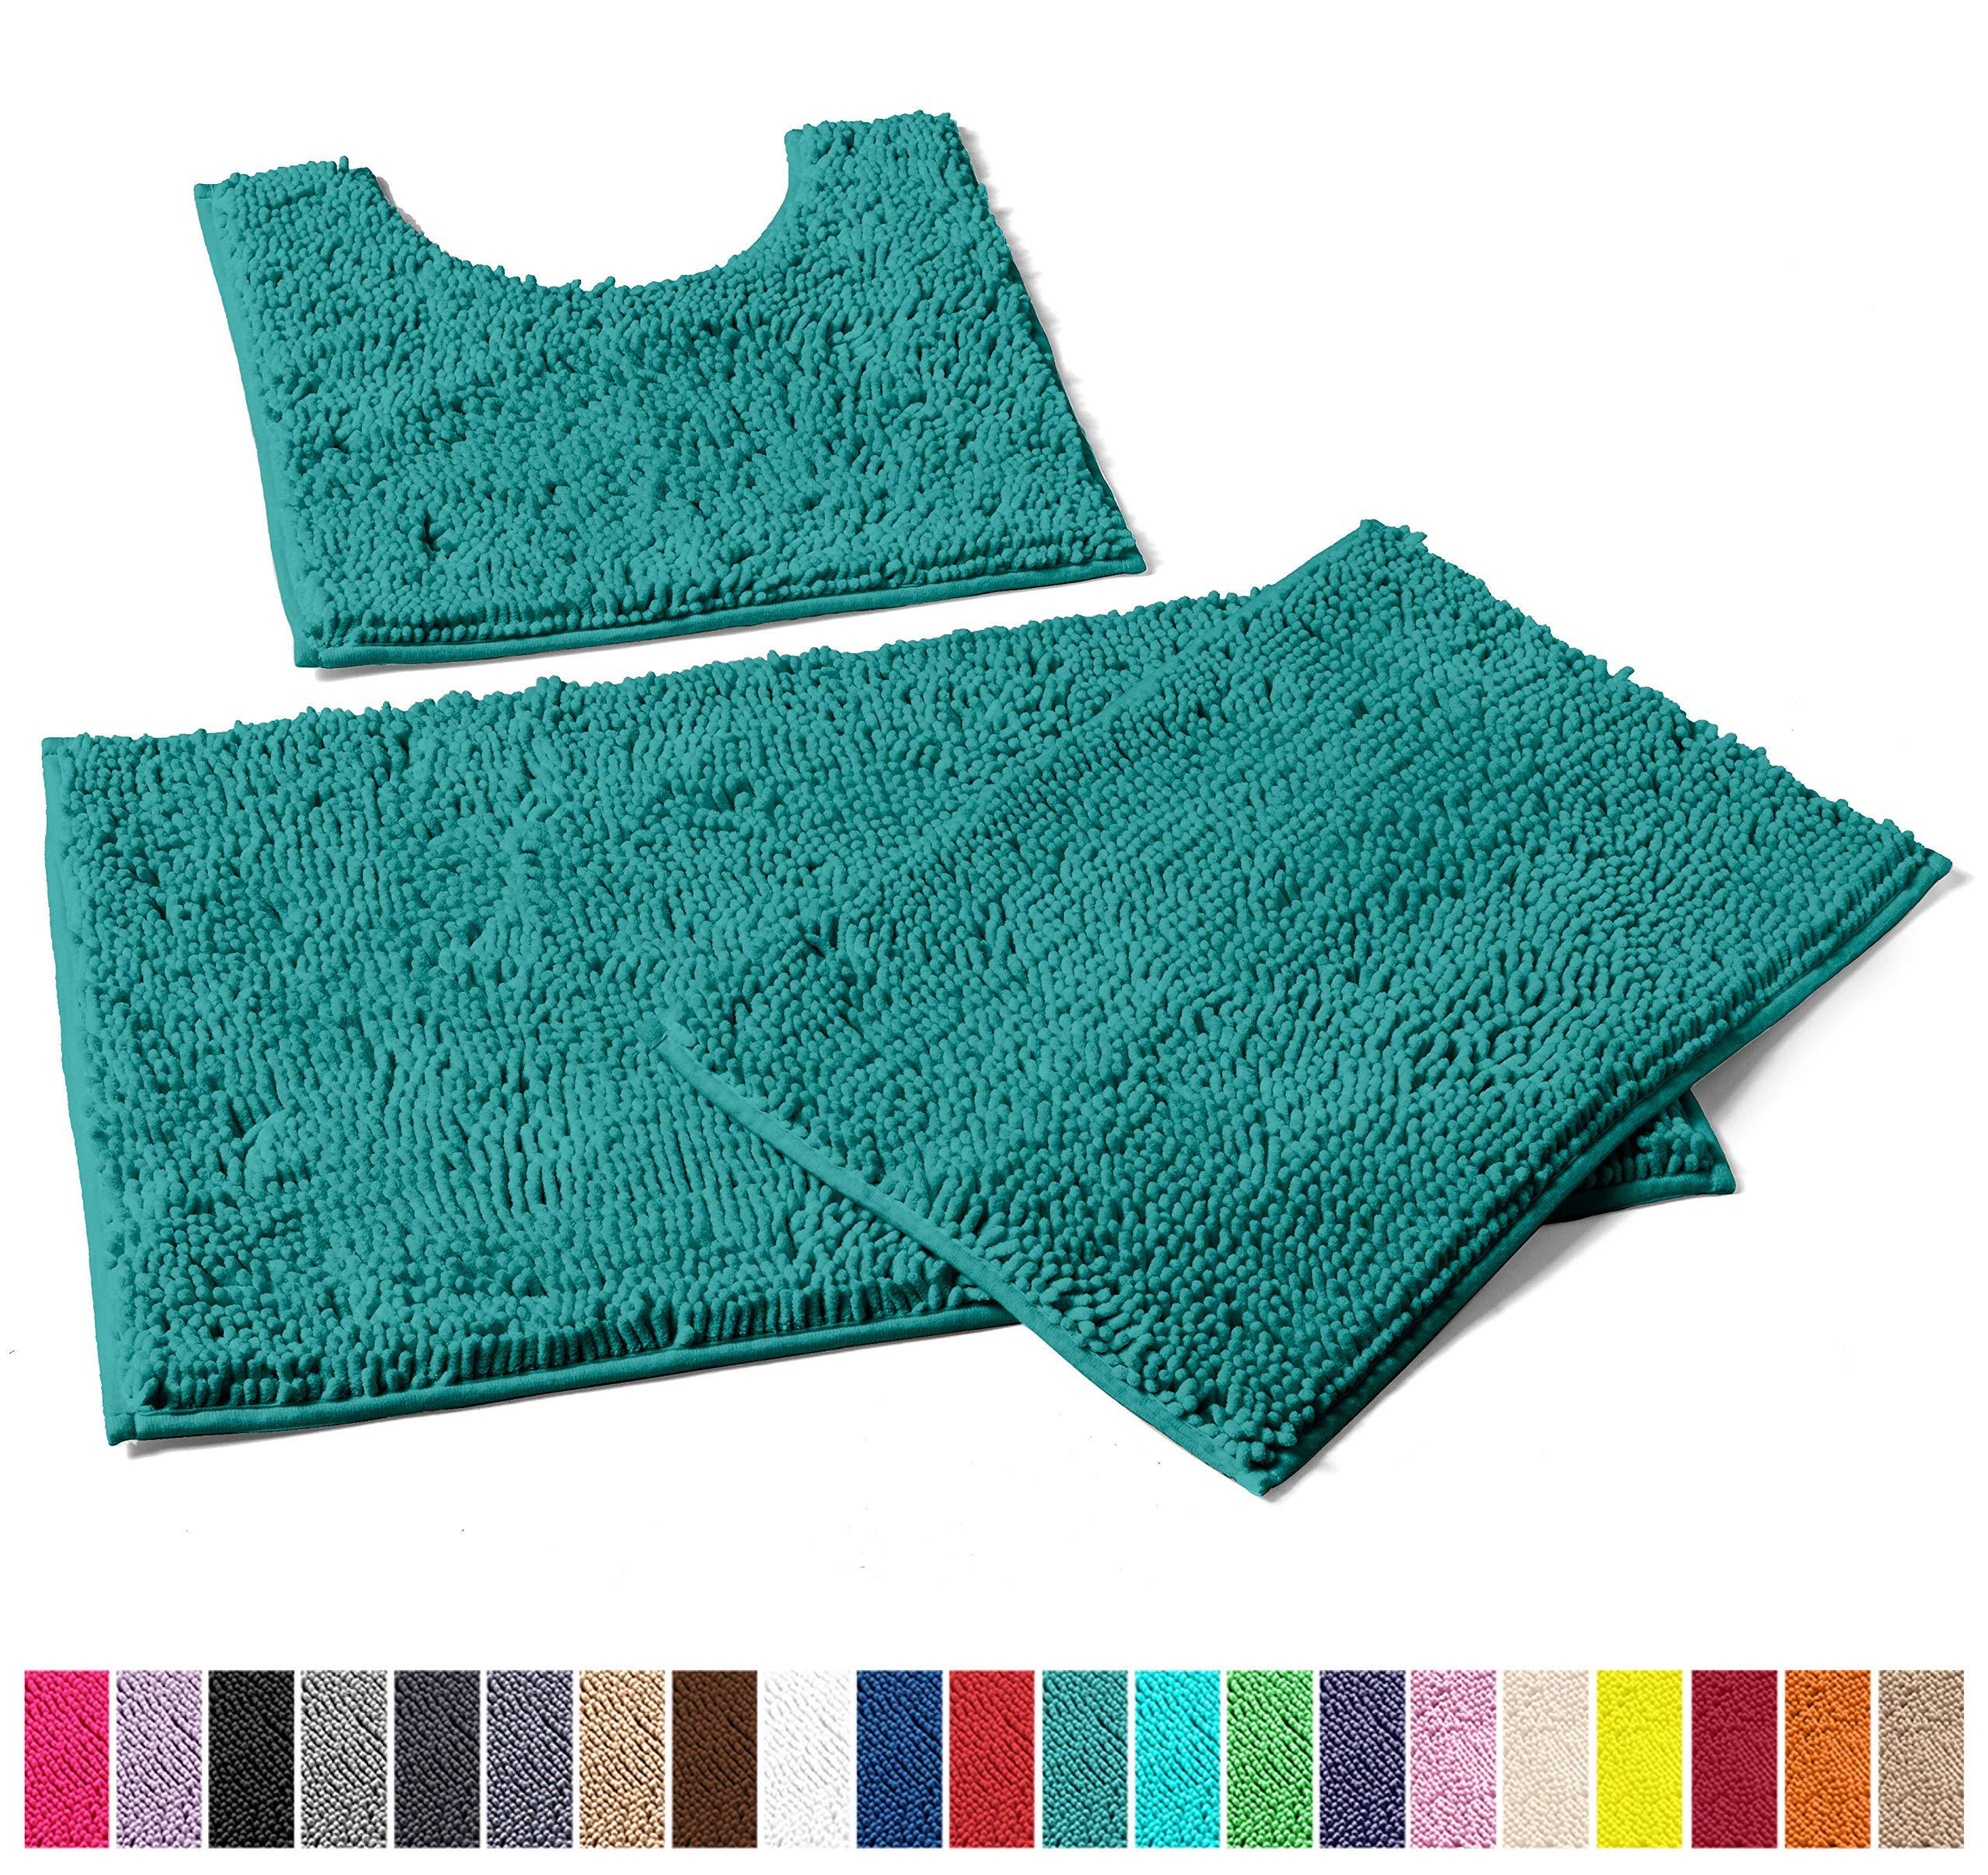 LuxUrux Bathroom Rugs 3pc Non-Slip Shaggy Chenille Bathroom Mat Set, Includes U-Shaped Contour Toilet Mat, 20 x 30'' and 16 x 24'' Bath Mat, Machine Washable (3 Pc Set - Style A, Turquoise)